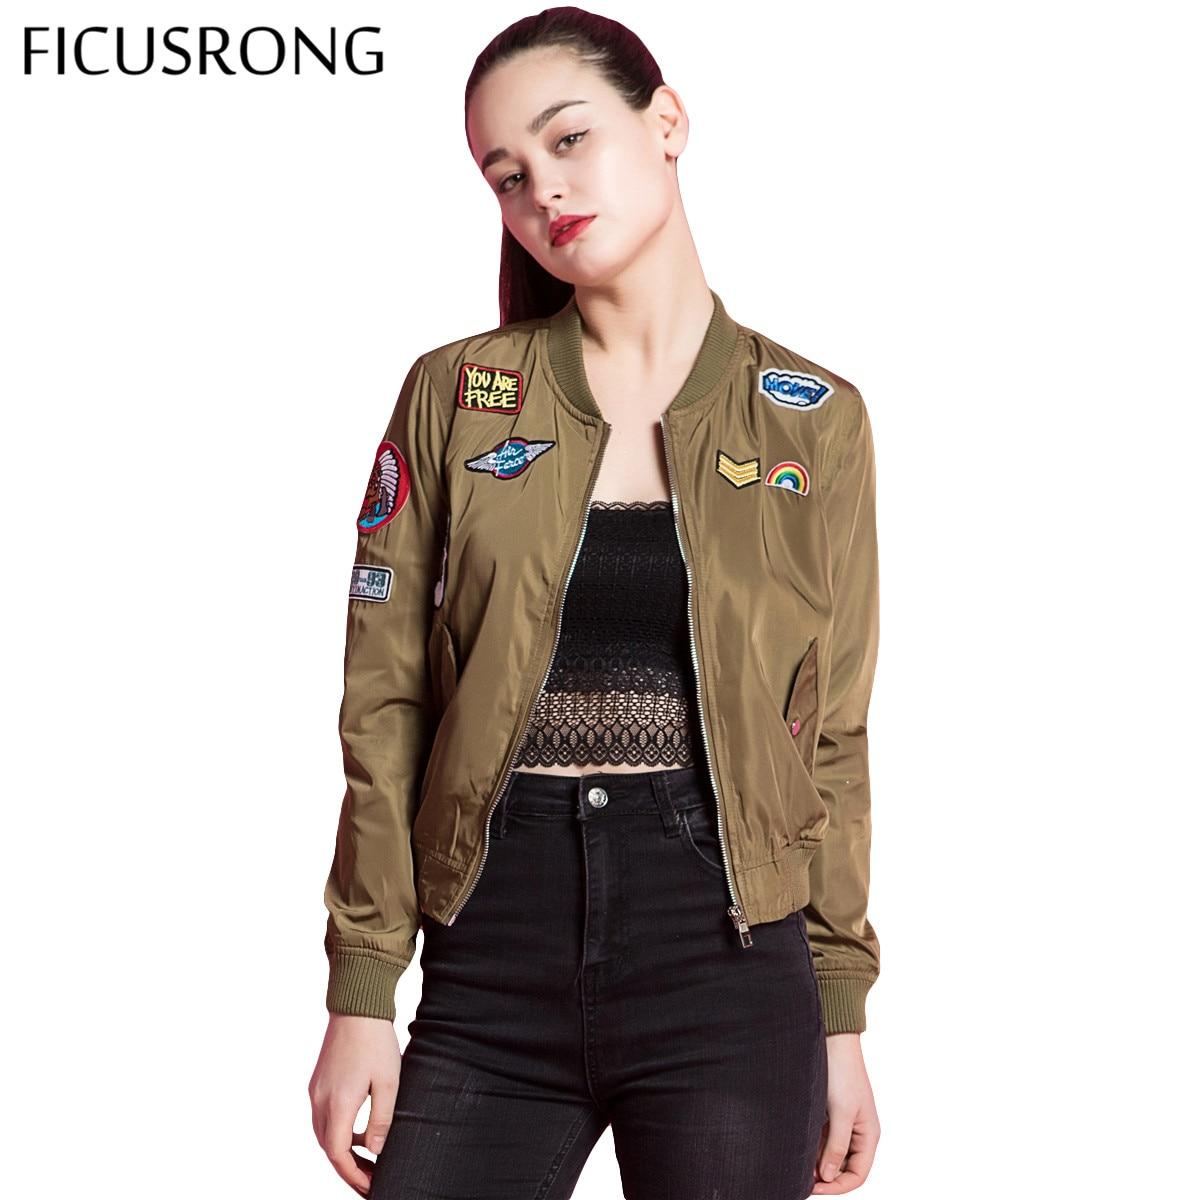 2019 New Spring Female   Jacket   Vintage Patch Designs   Basic     Jacket   Coat Street Autumn Bomber   Jacket   Women FICUSRONG